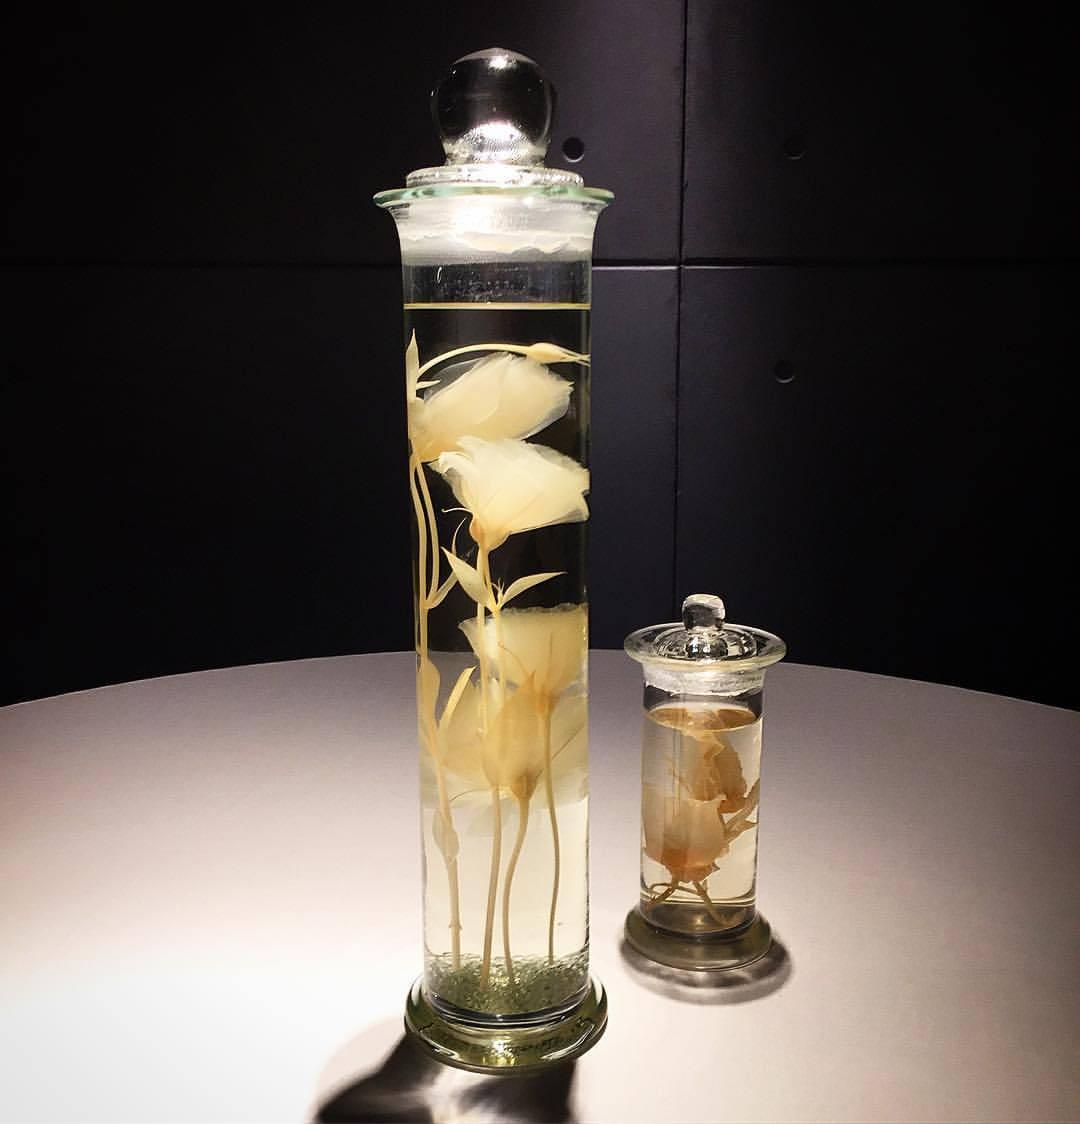 Flowers preserved in alcohol.  #spain #madrid #ristorantecibo  (at Puerta del Sol Madrid)